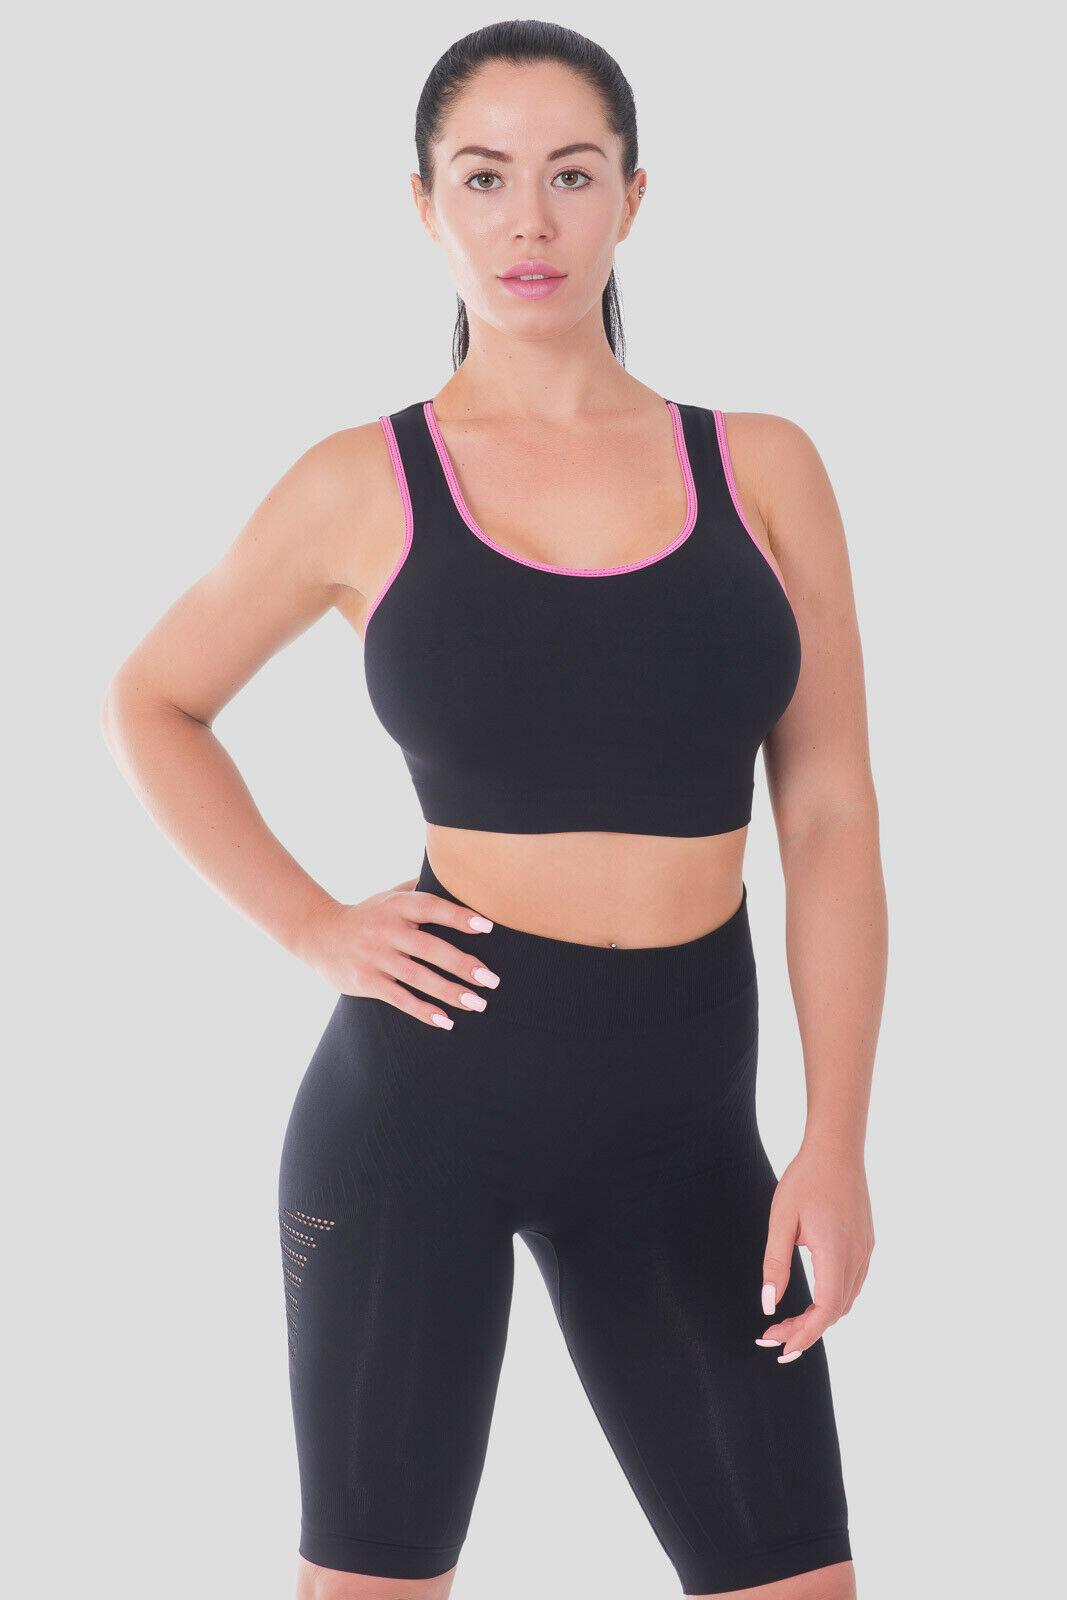 Bellissima-Women-039-s-Sport-Bra-Running-Yoga-Workout-Fitness-Racerback-Seamless thumbnail 32